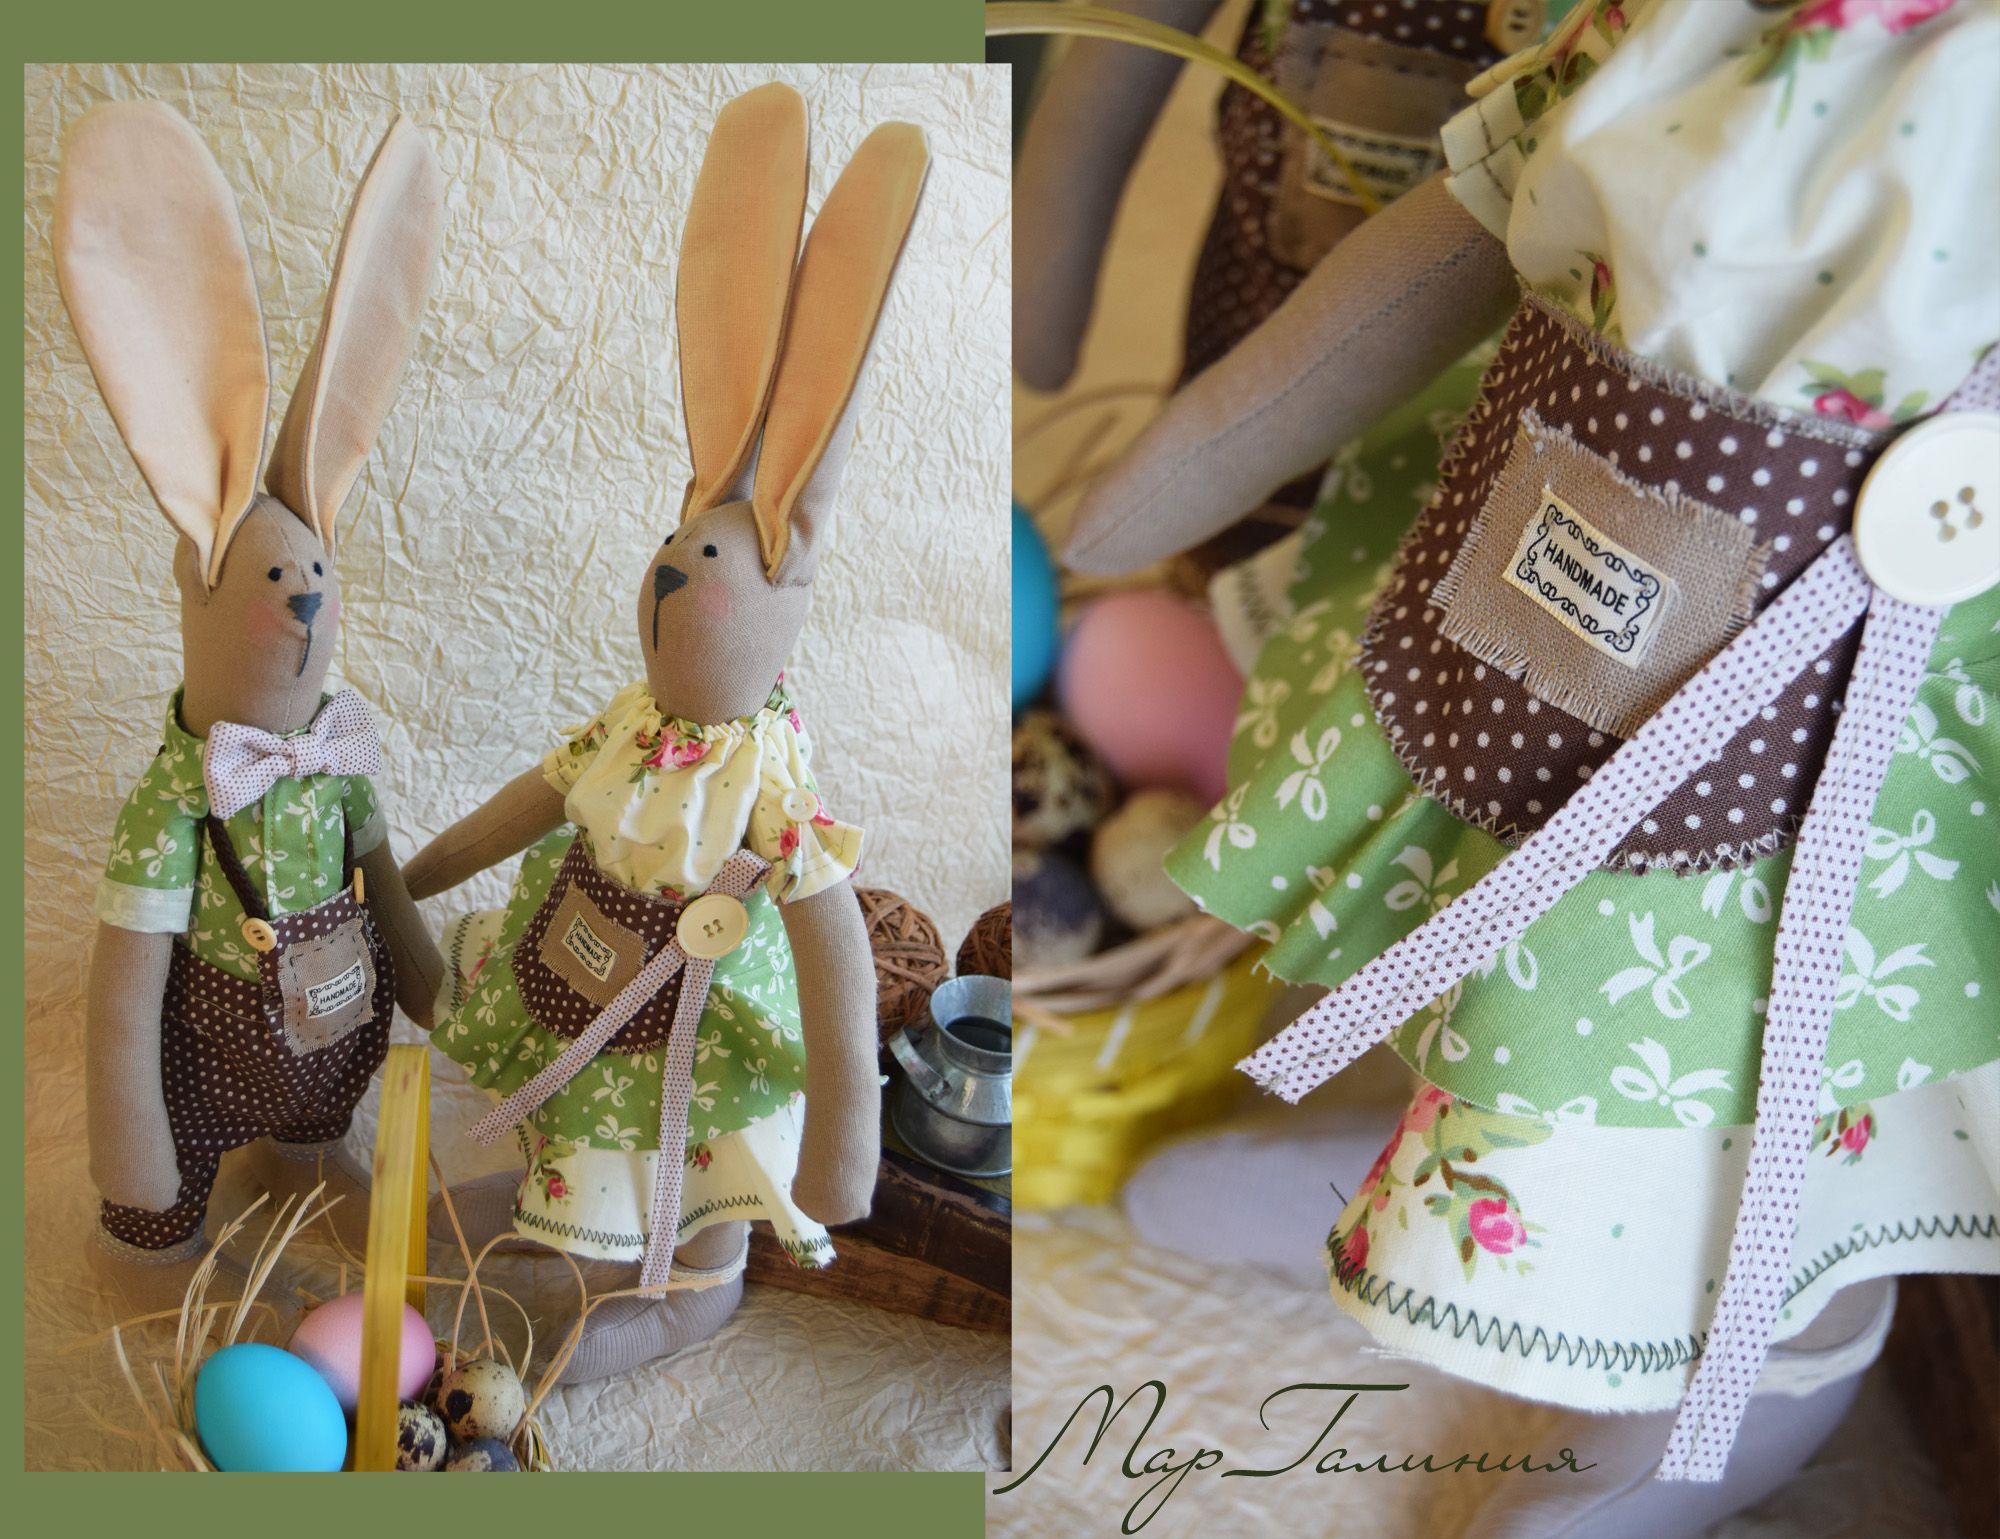 текстильнаяигрушка интерьерныеигрушки игрушкатильда маргалиния подарки тильда